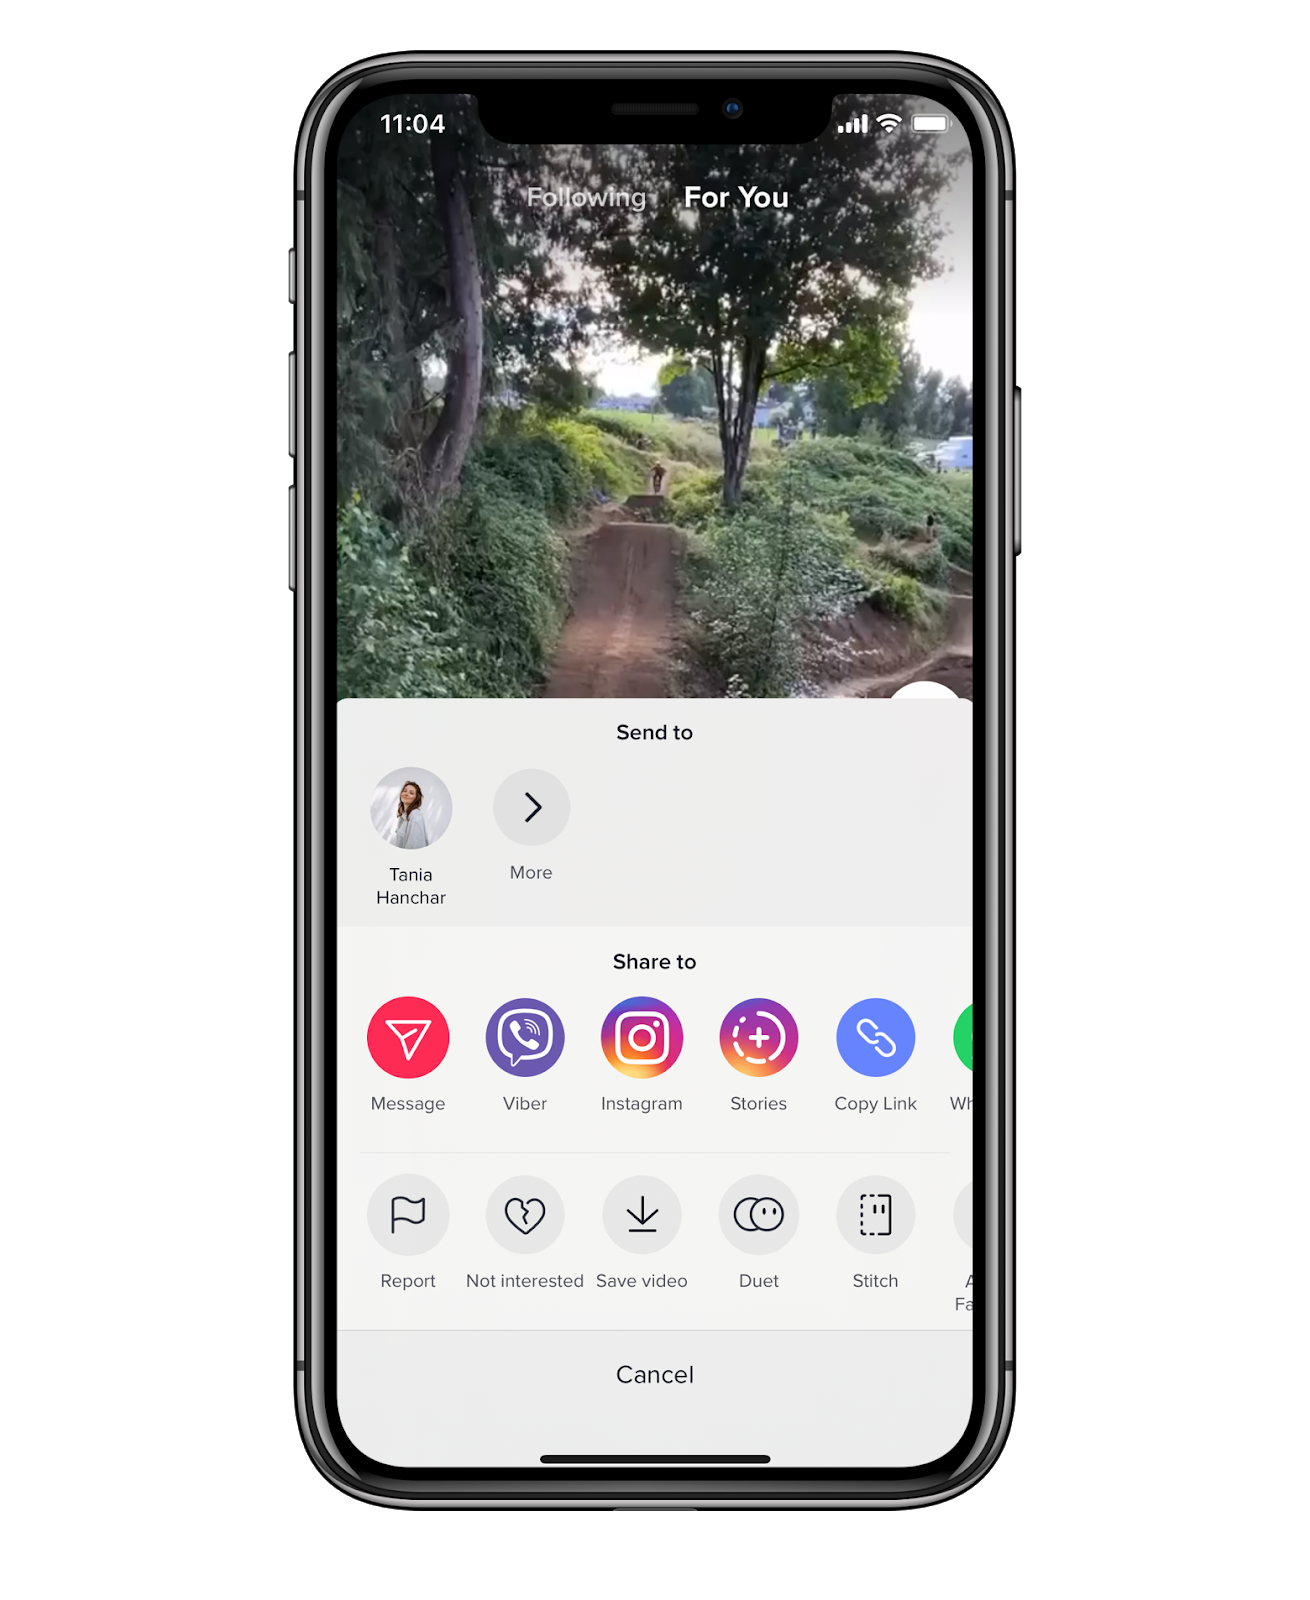 TikTok Send to option on iPhone